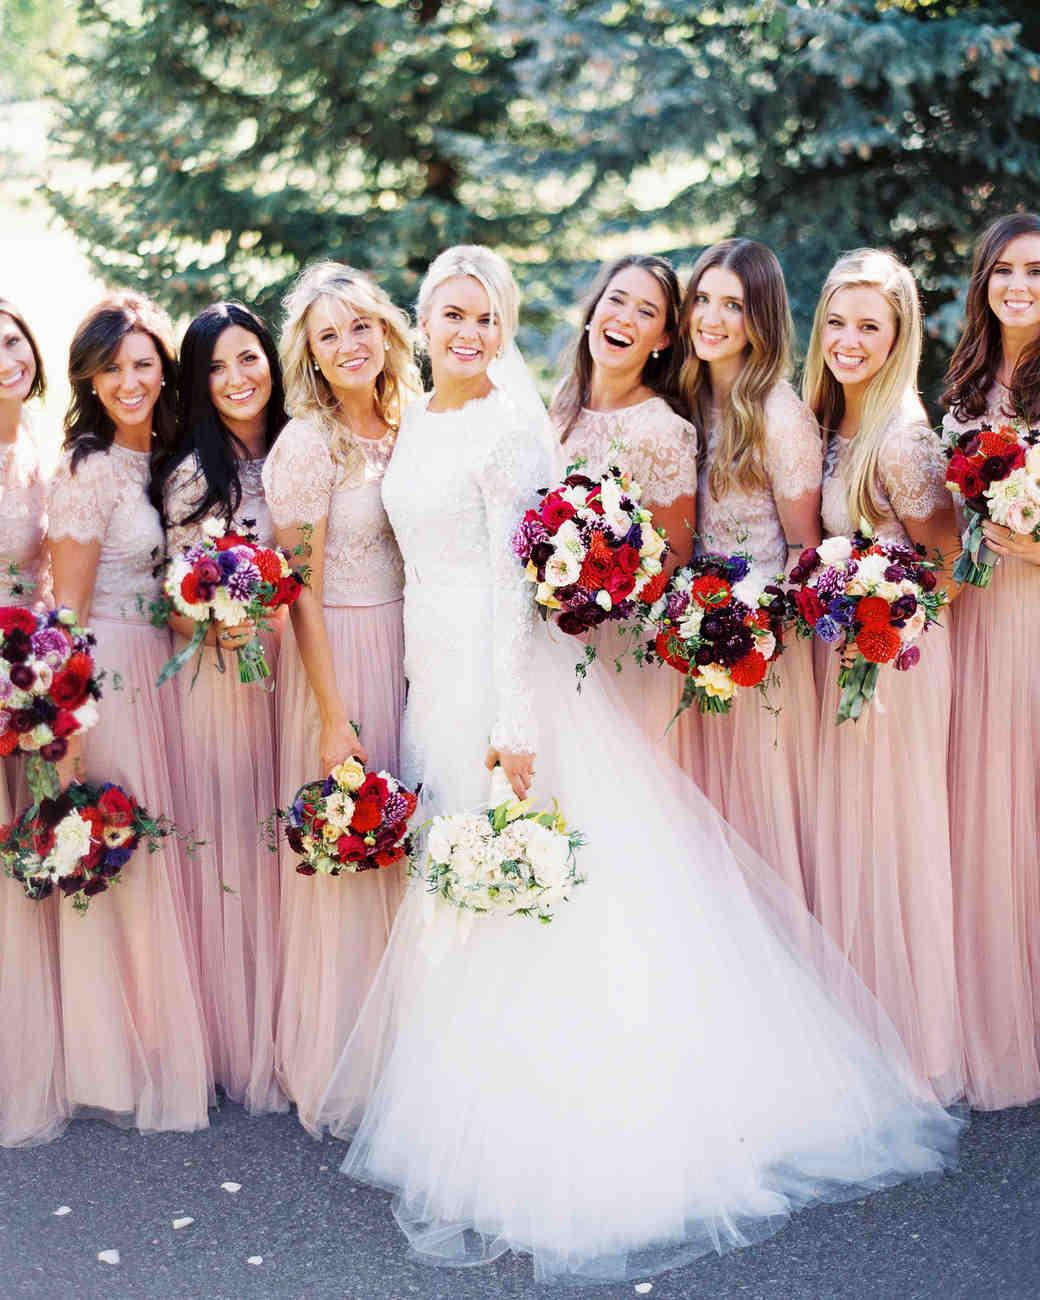 wedding bridesmaids pink dresses bride